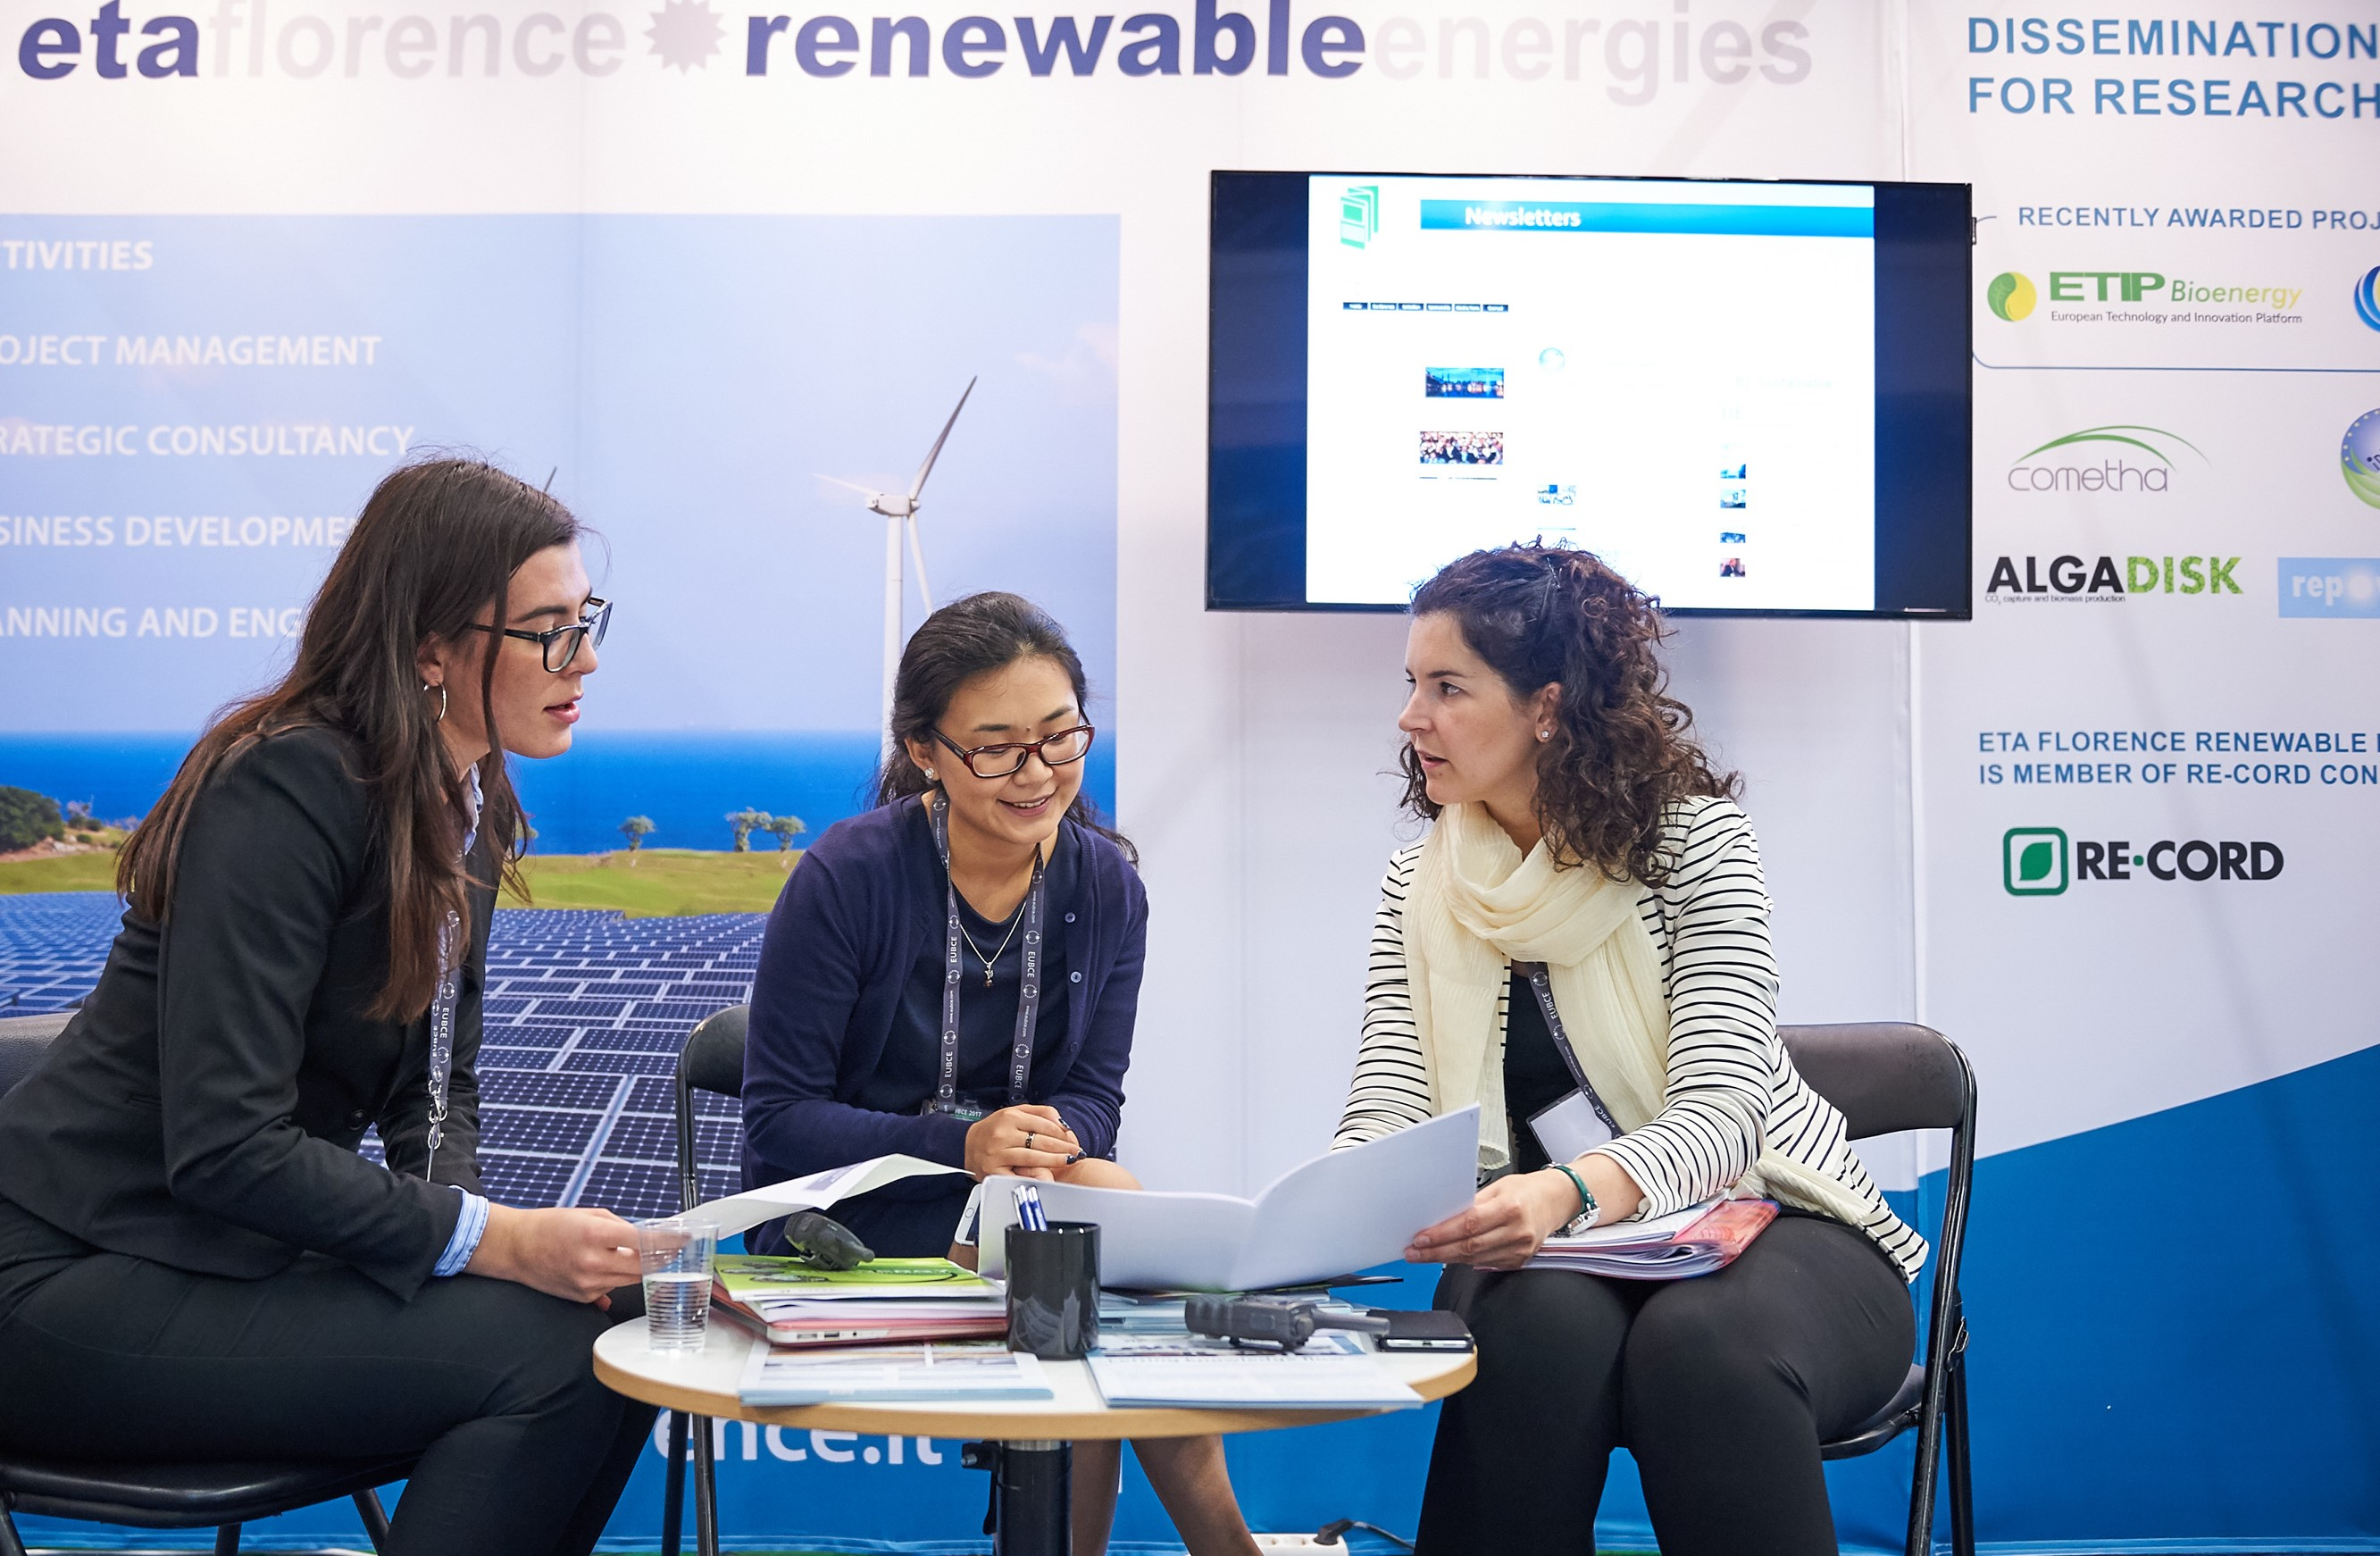 Stockholm, June 12-15 2017: 25th European Biomass Conference & Exhibition